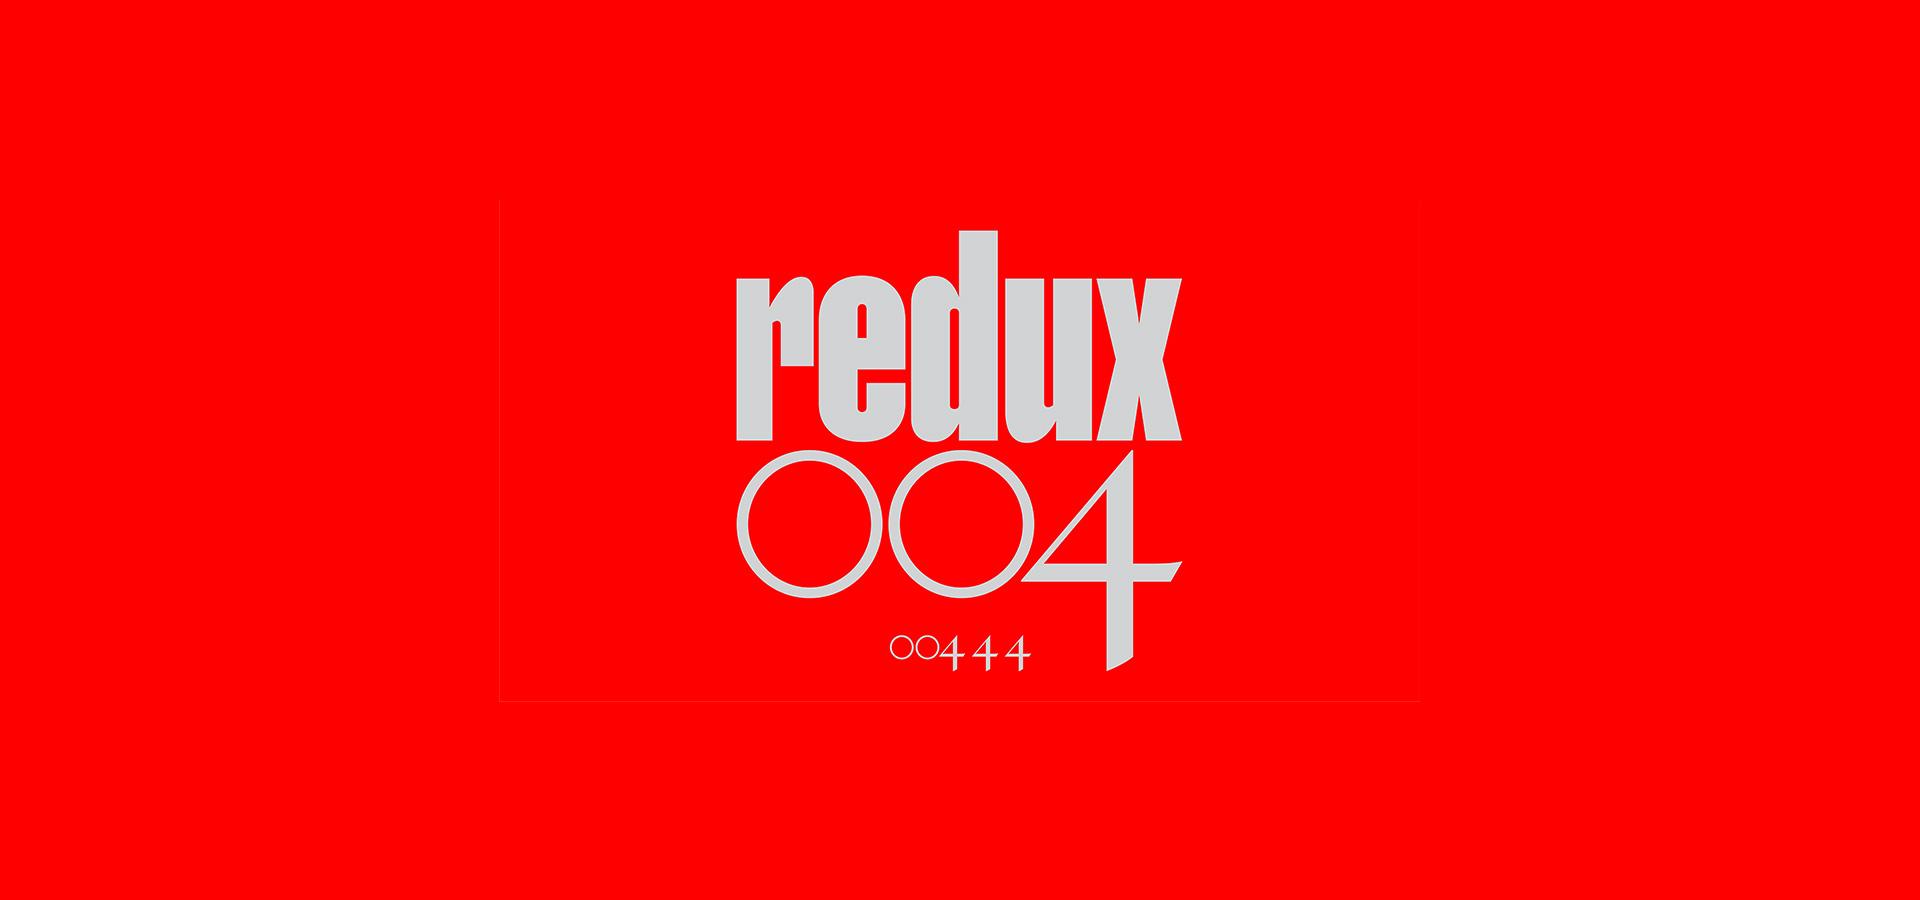 REDUX 004 Artwork